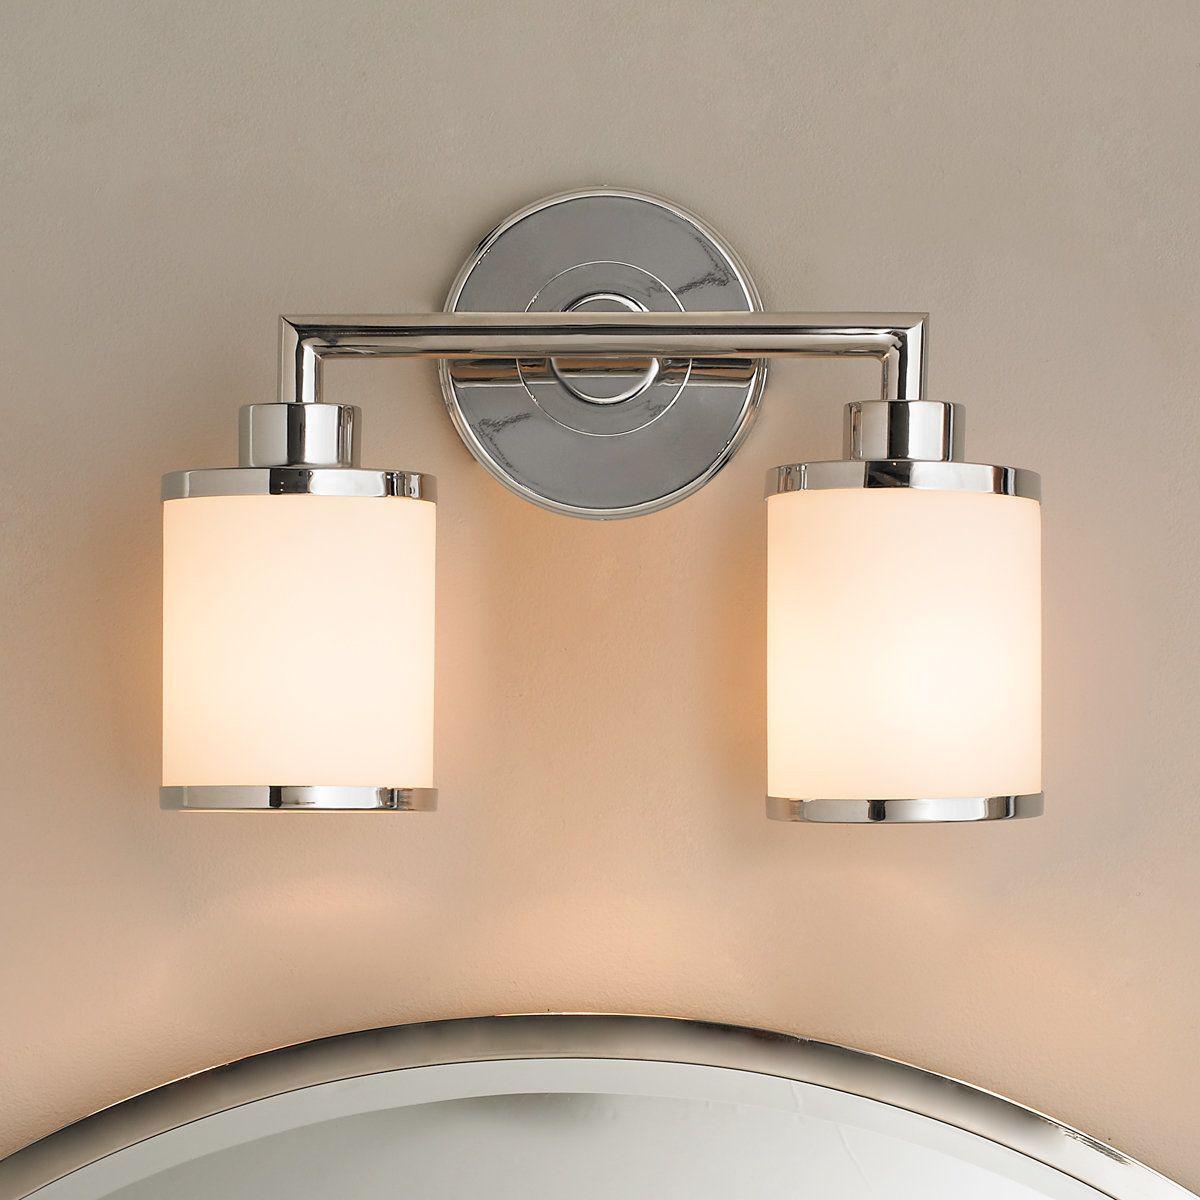 Contemporary Urban Bath Vanity Light 2 Light In 2021 Bath Vanity Lighting Bath Vanities Vanity Lighting Unique bath vanity lights